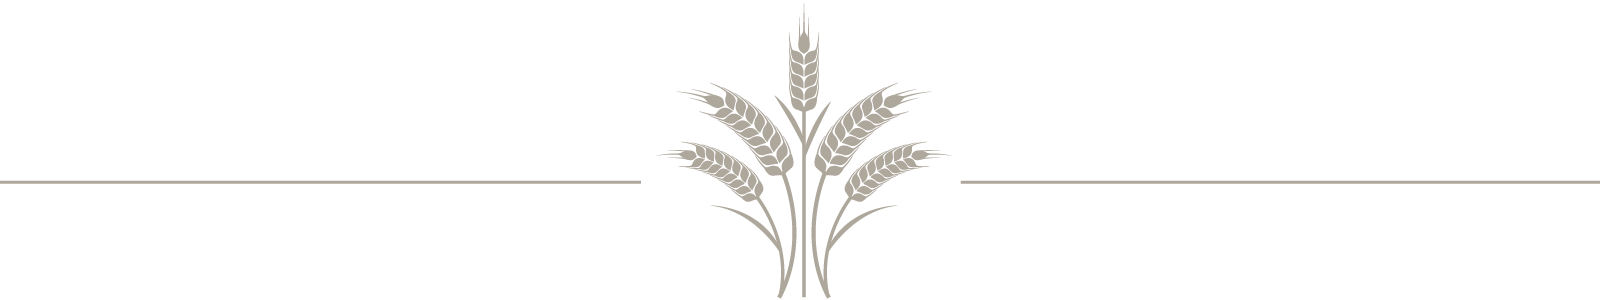 hambleton-bakery-divider_journal.png